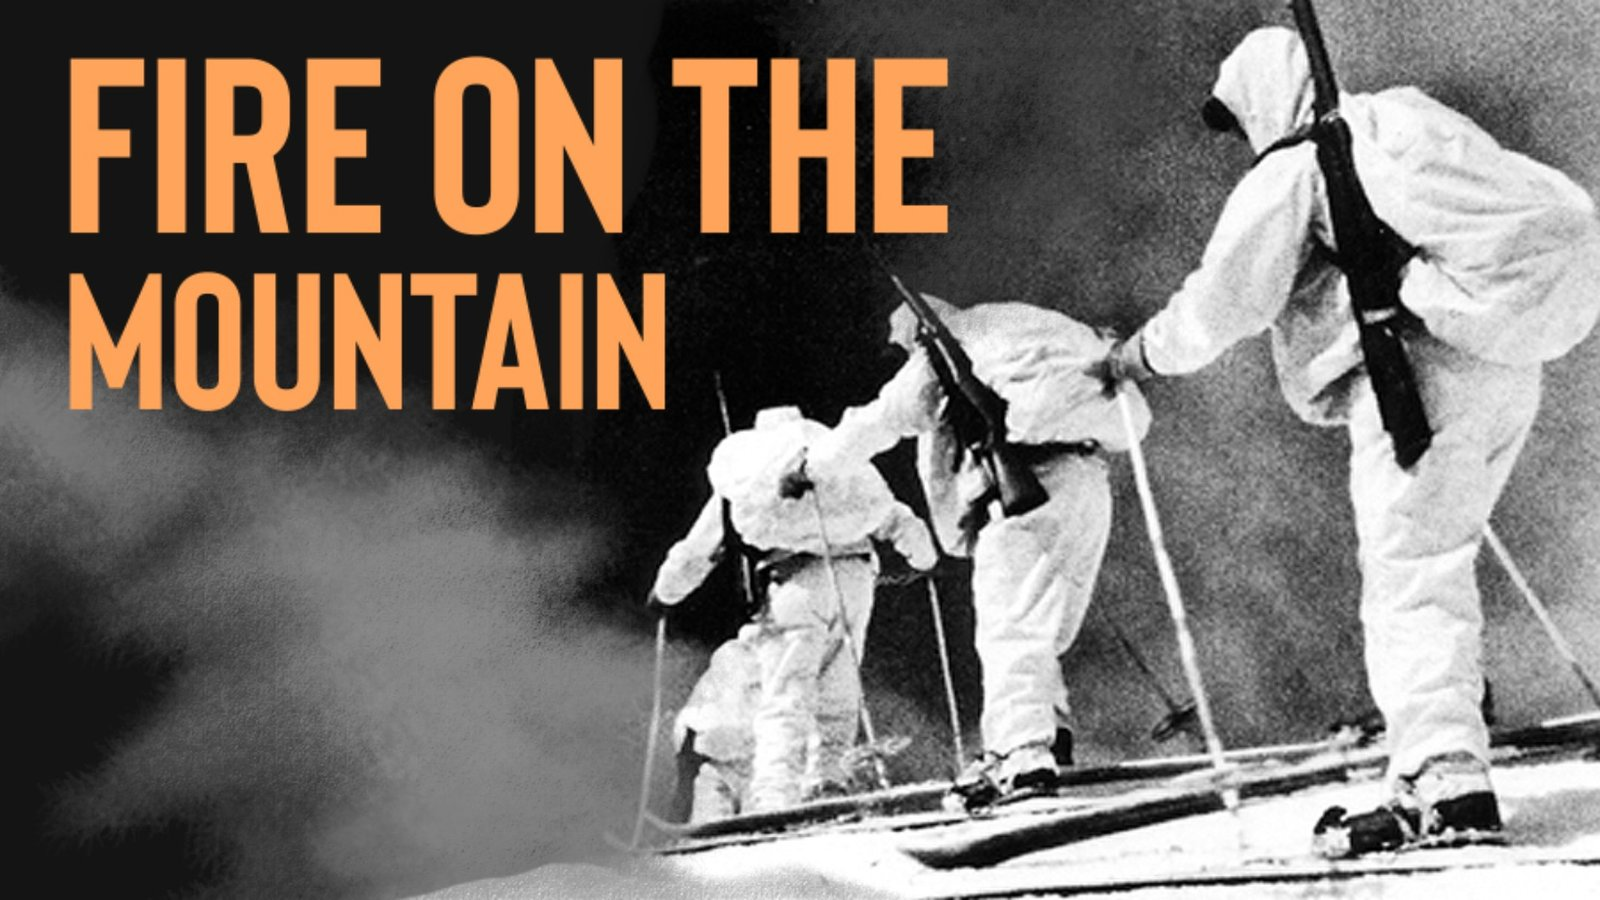 Fire On the Mountain - America's WWII Winter Warfare Fighting Unit